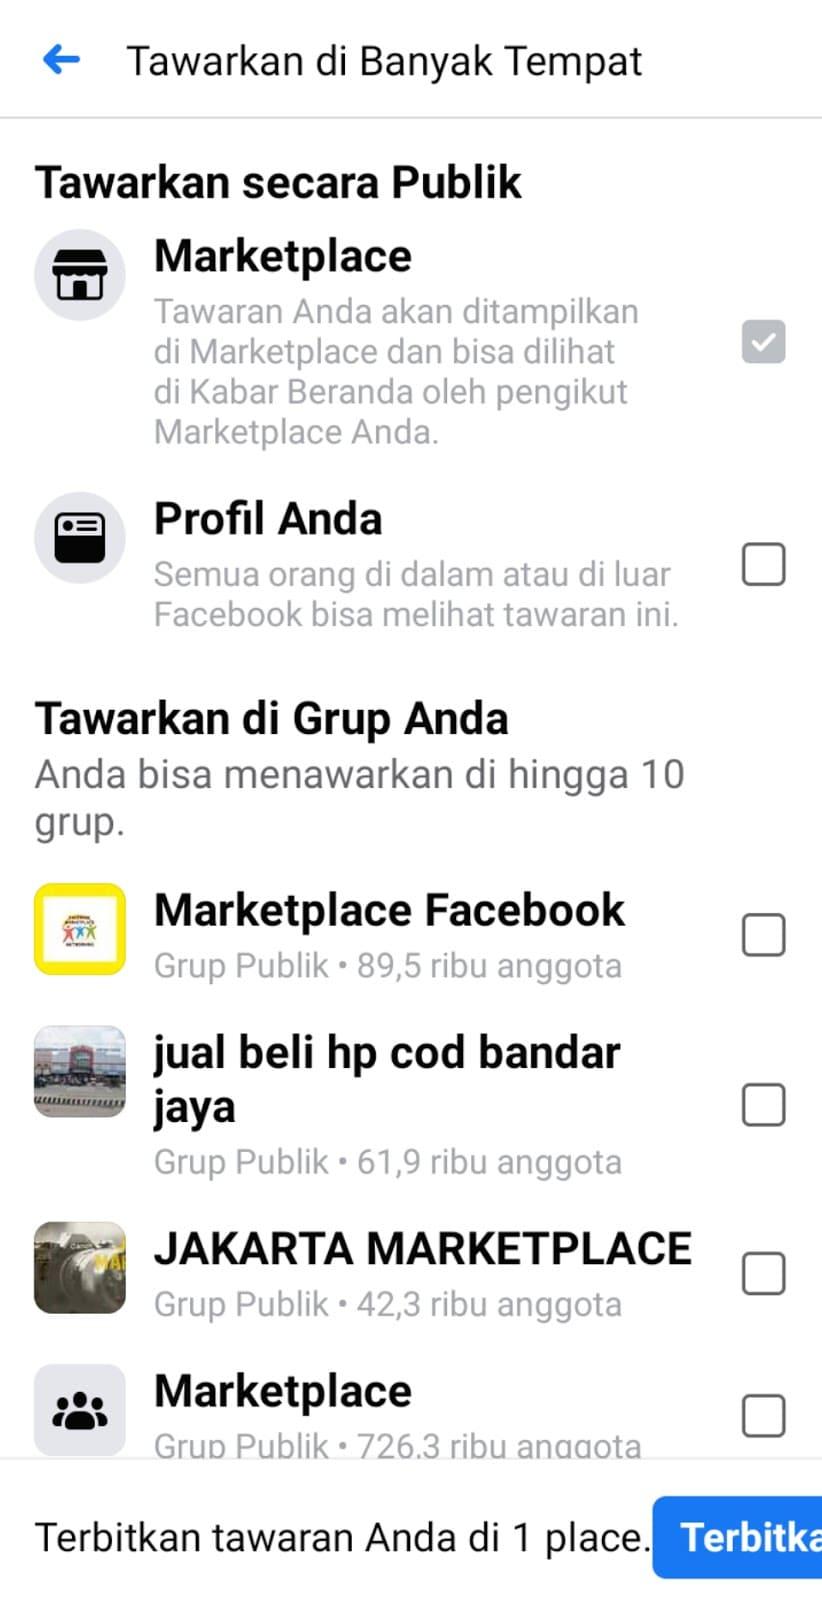 Cara Jualan di Marketplace Facebook (FB) Biar Makin Laris